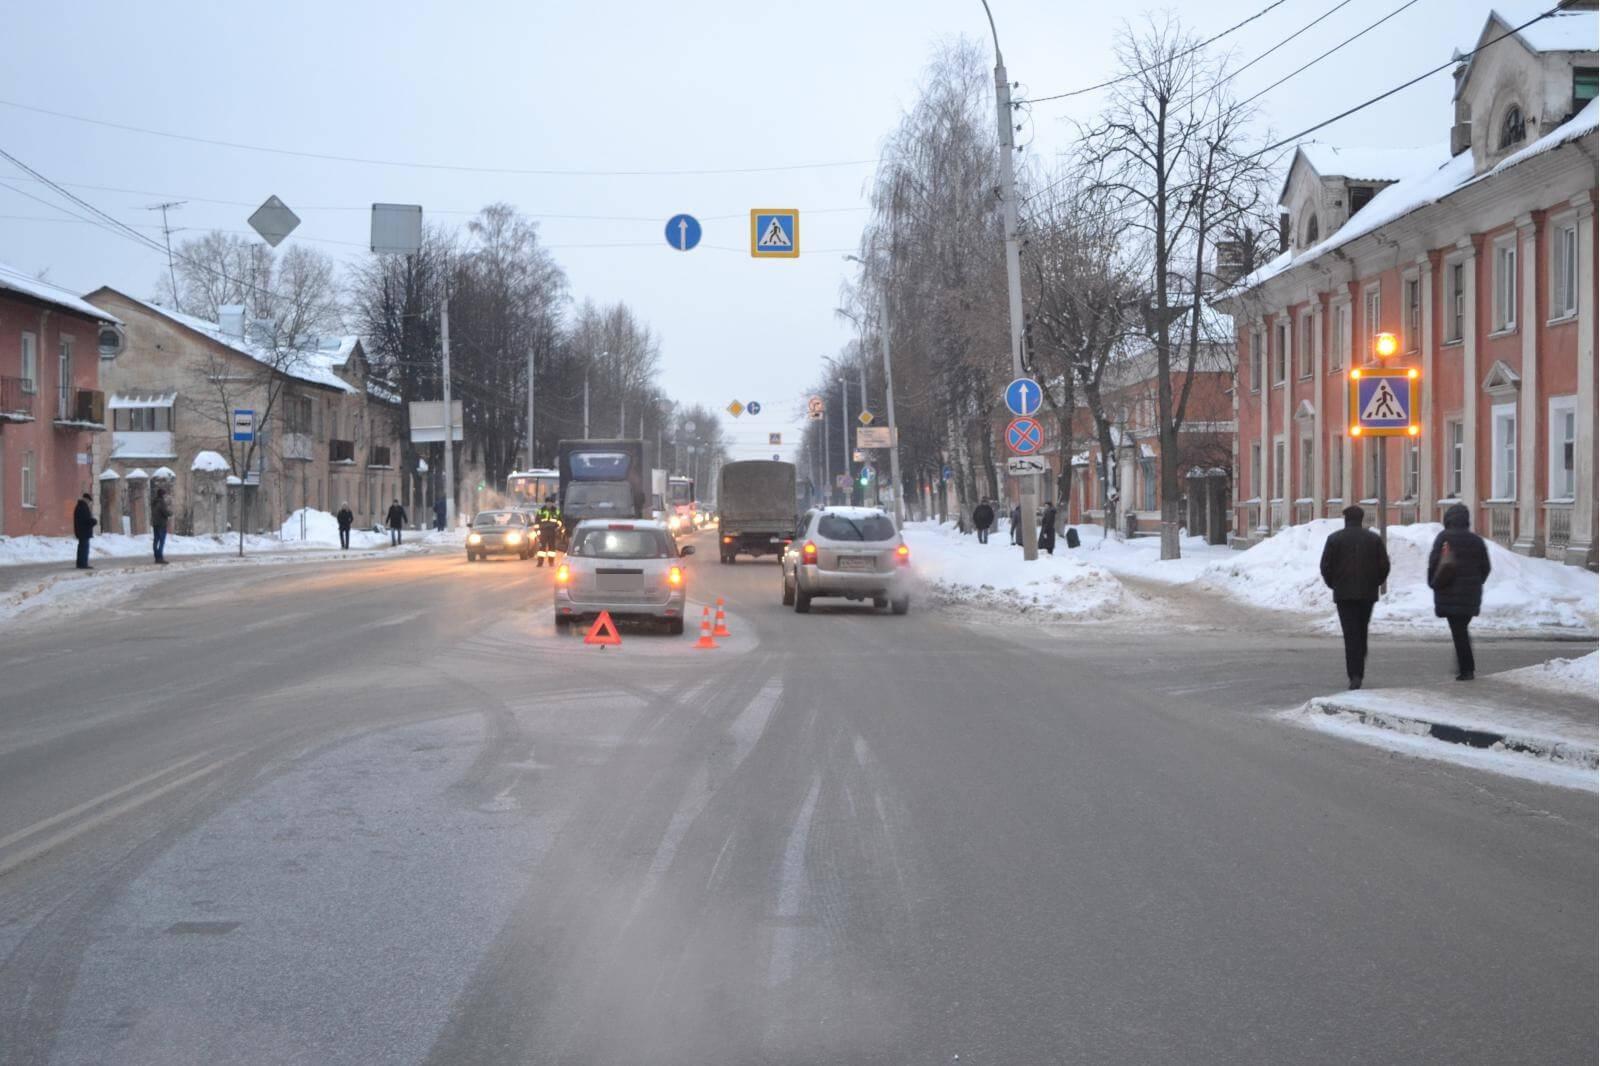 Будьте аккуратны на дороге